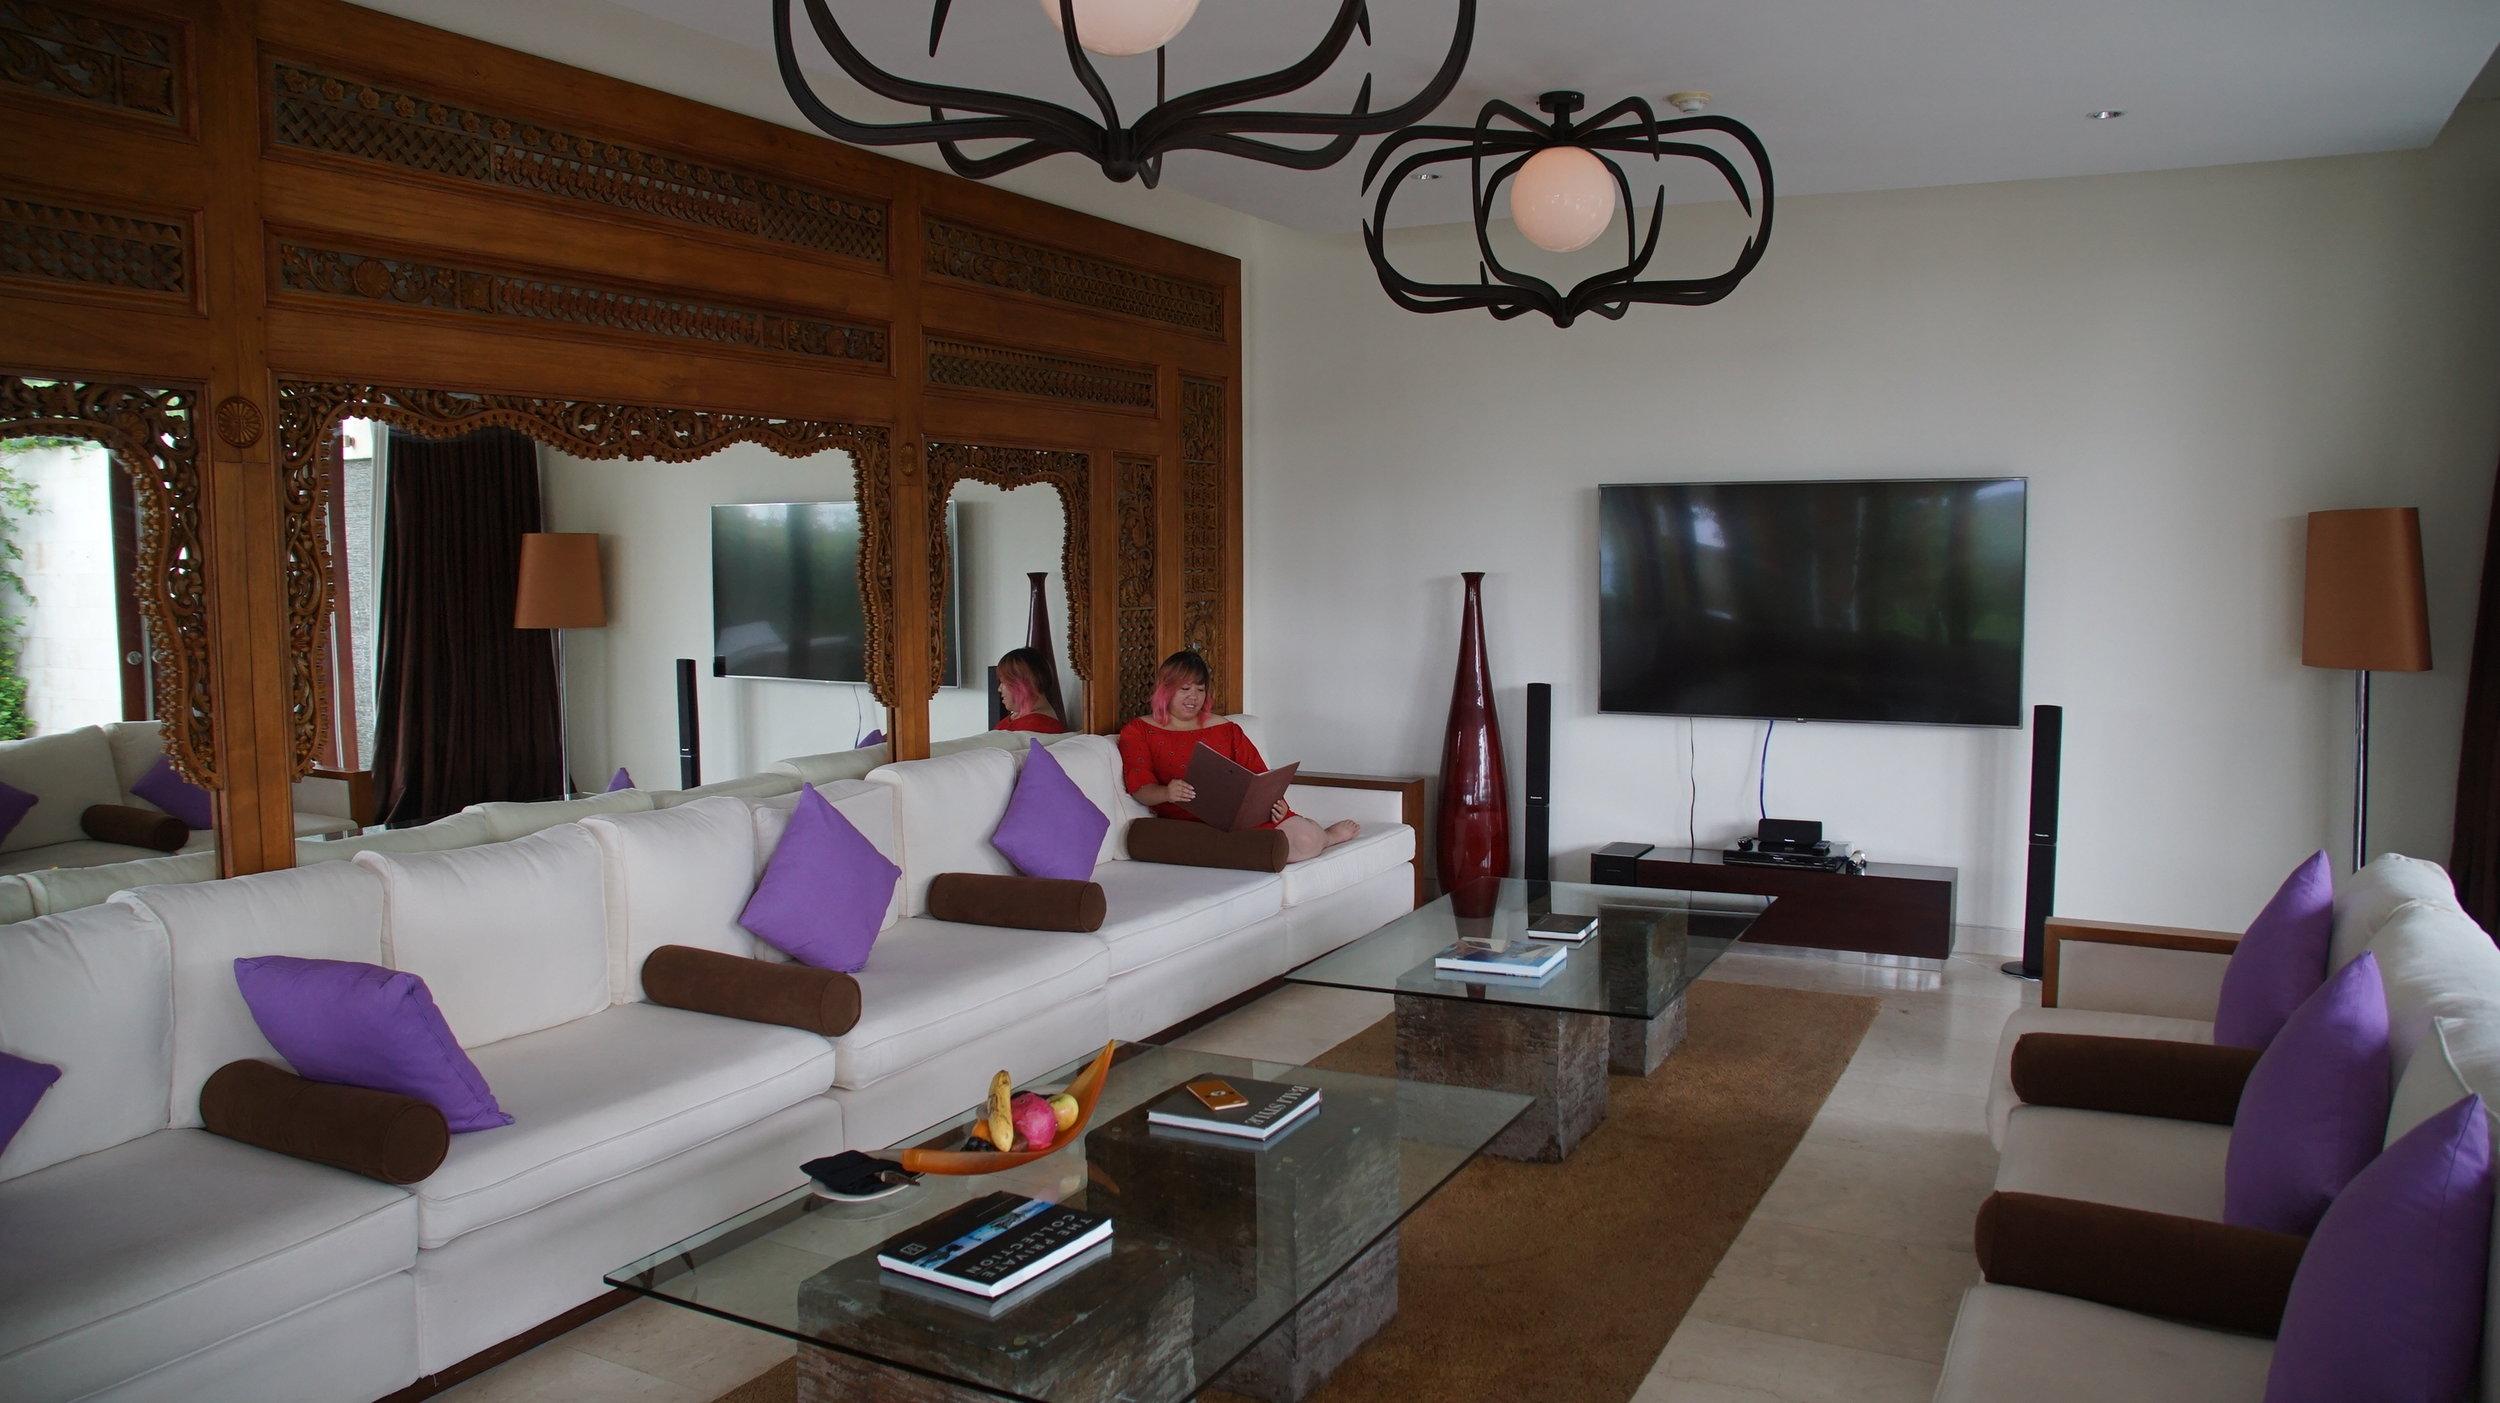 The Mood: Living Room